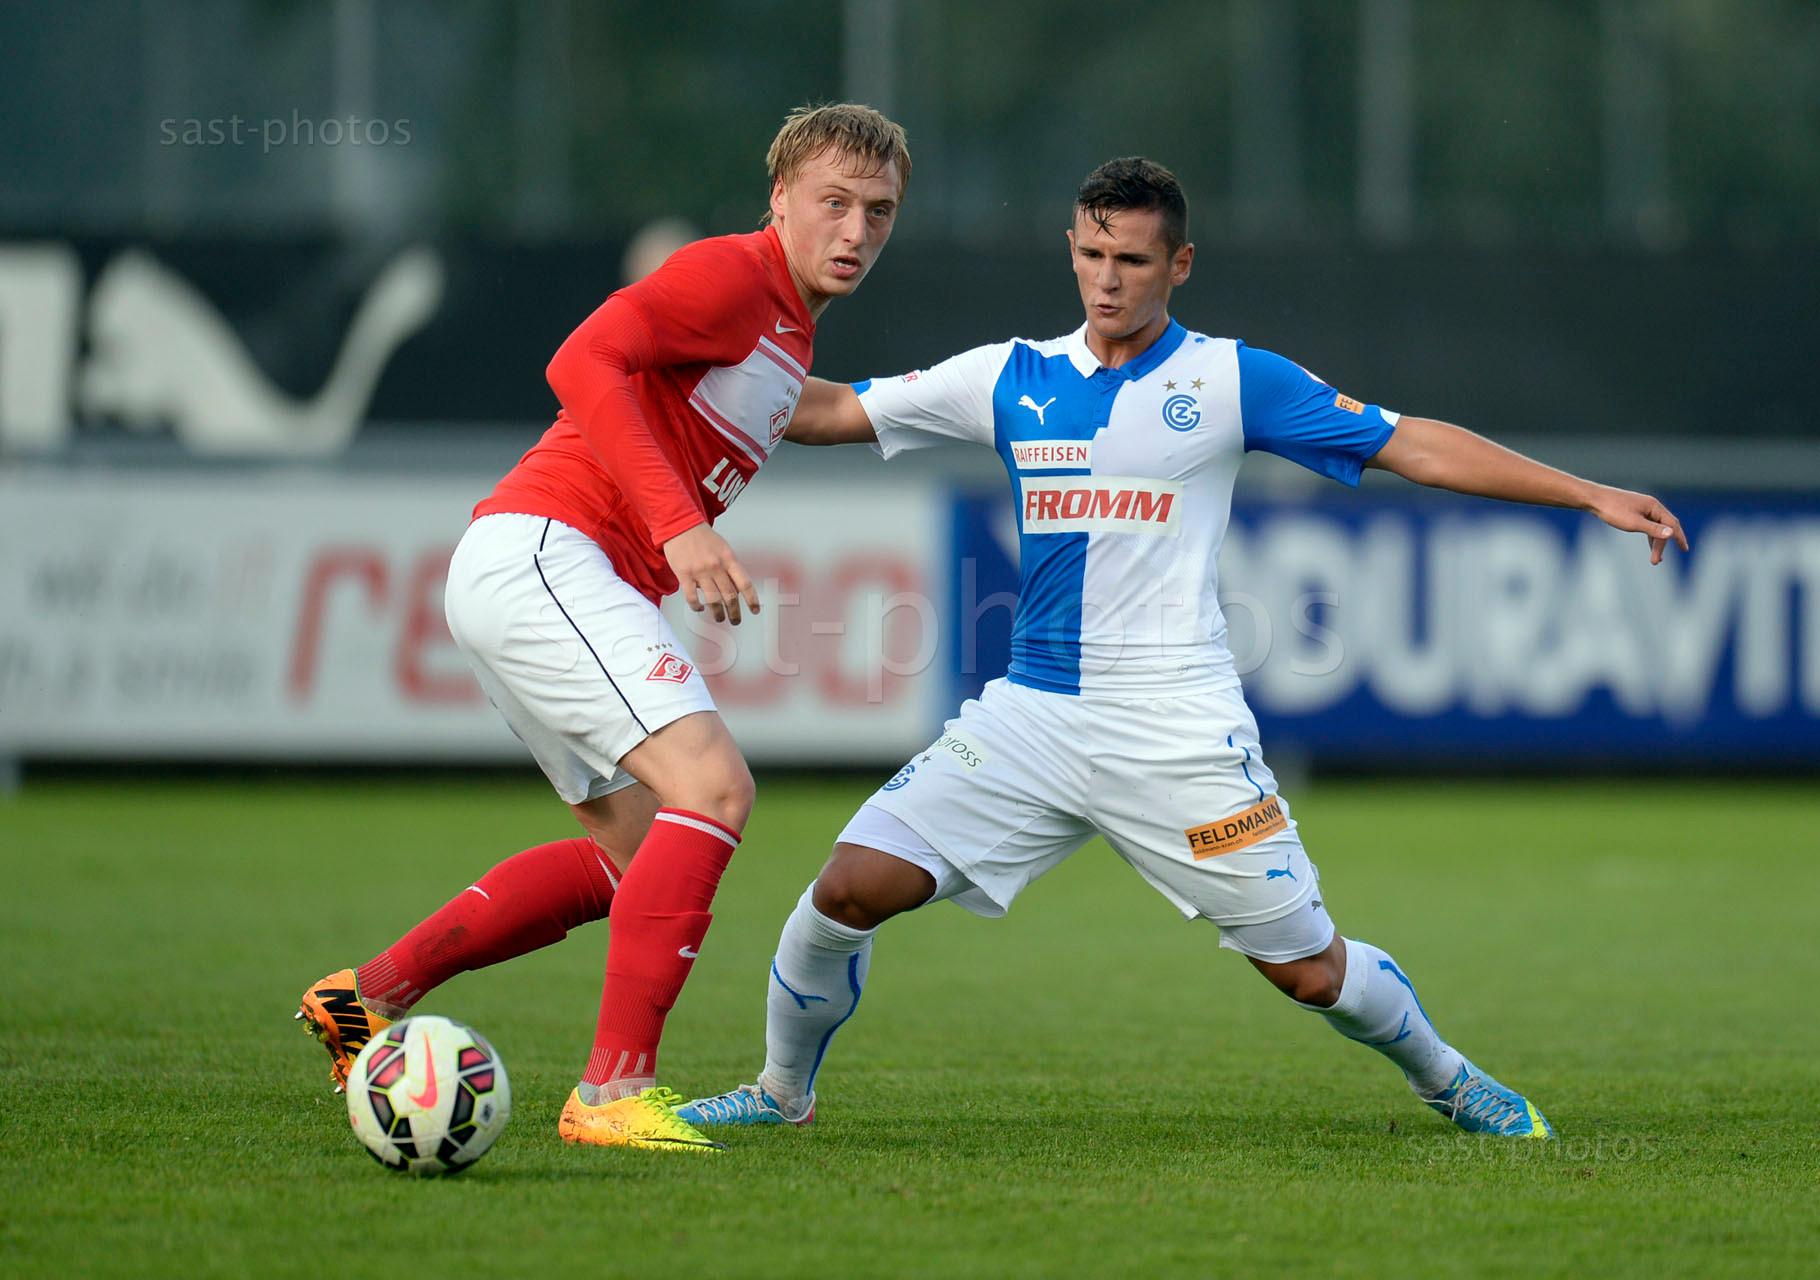 Sergey Bryzgalov (Spartak) gegen Shanj Tarashaj (GCZ)